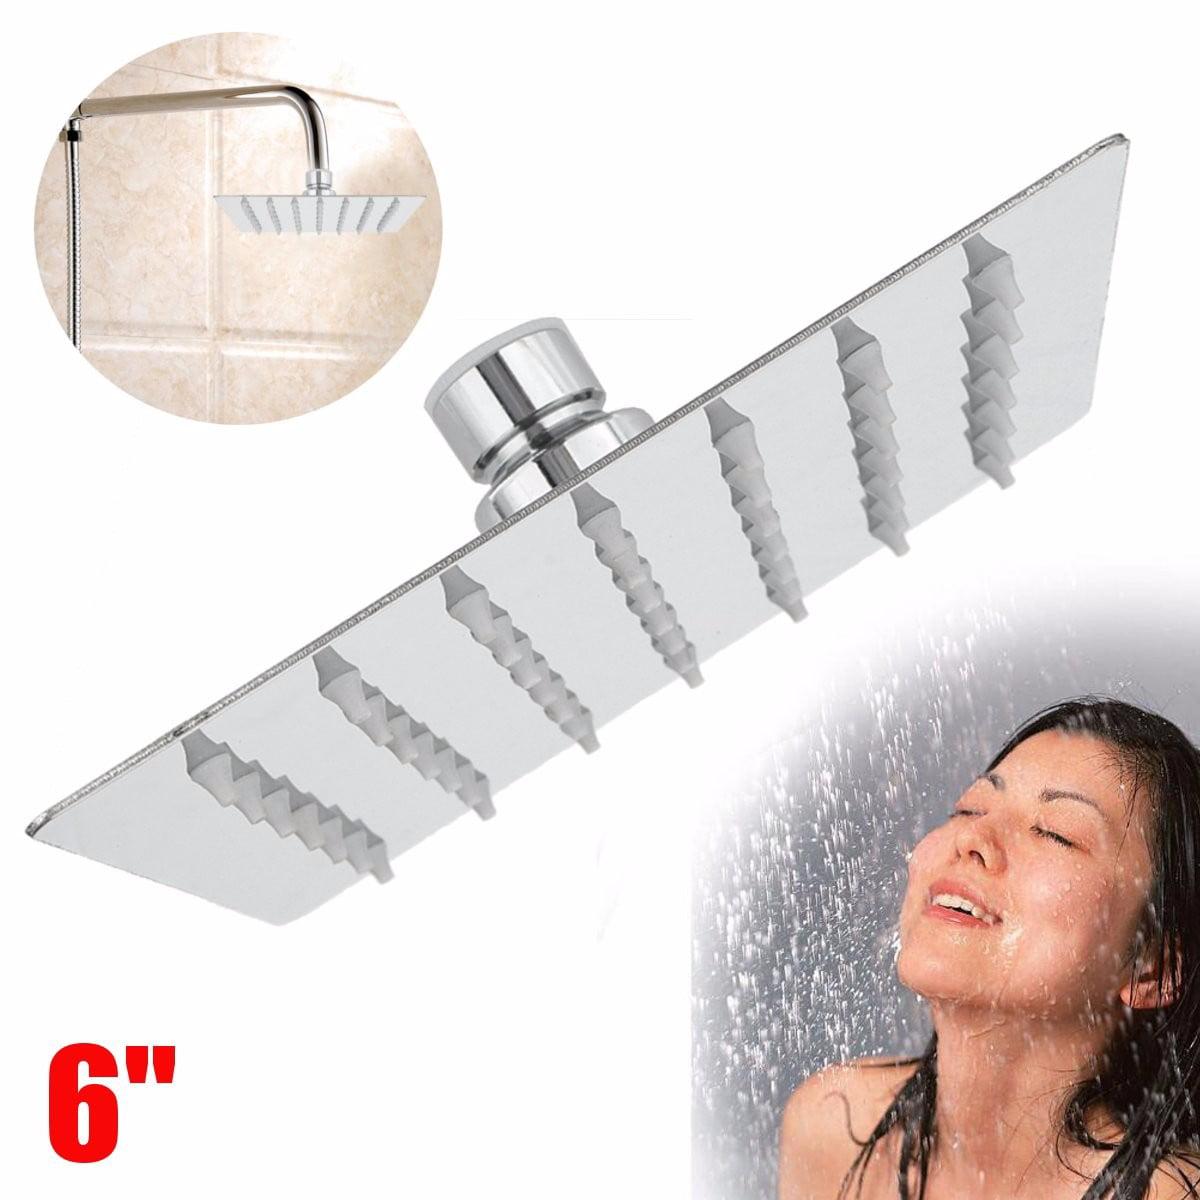 6'' 360° Square Stainless Steel Rain Shower Head Rainfall Bathroom Bathroom Accessories Top Sprayer